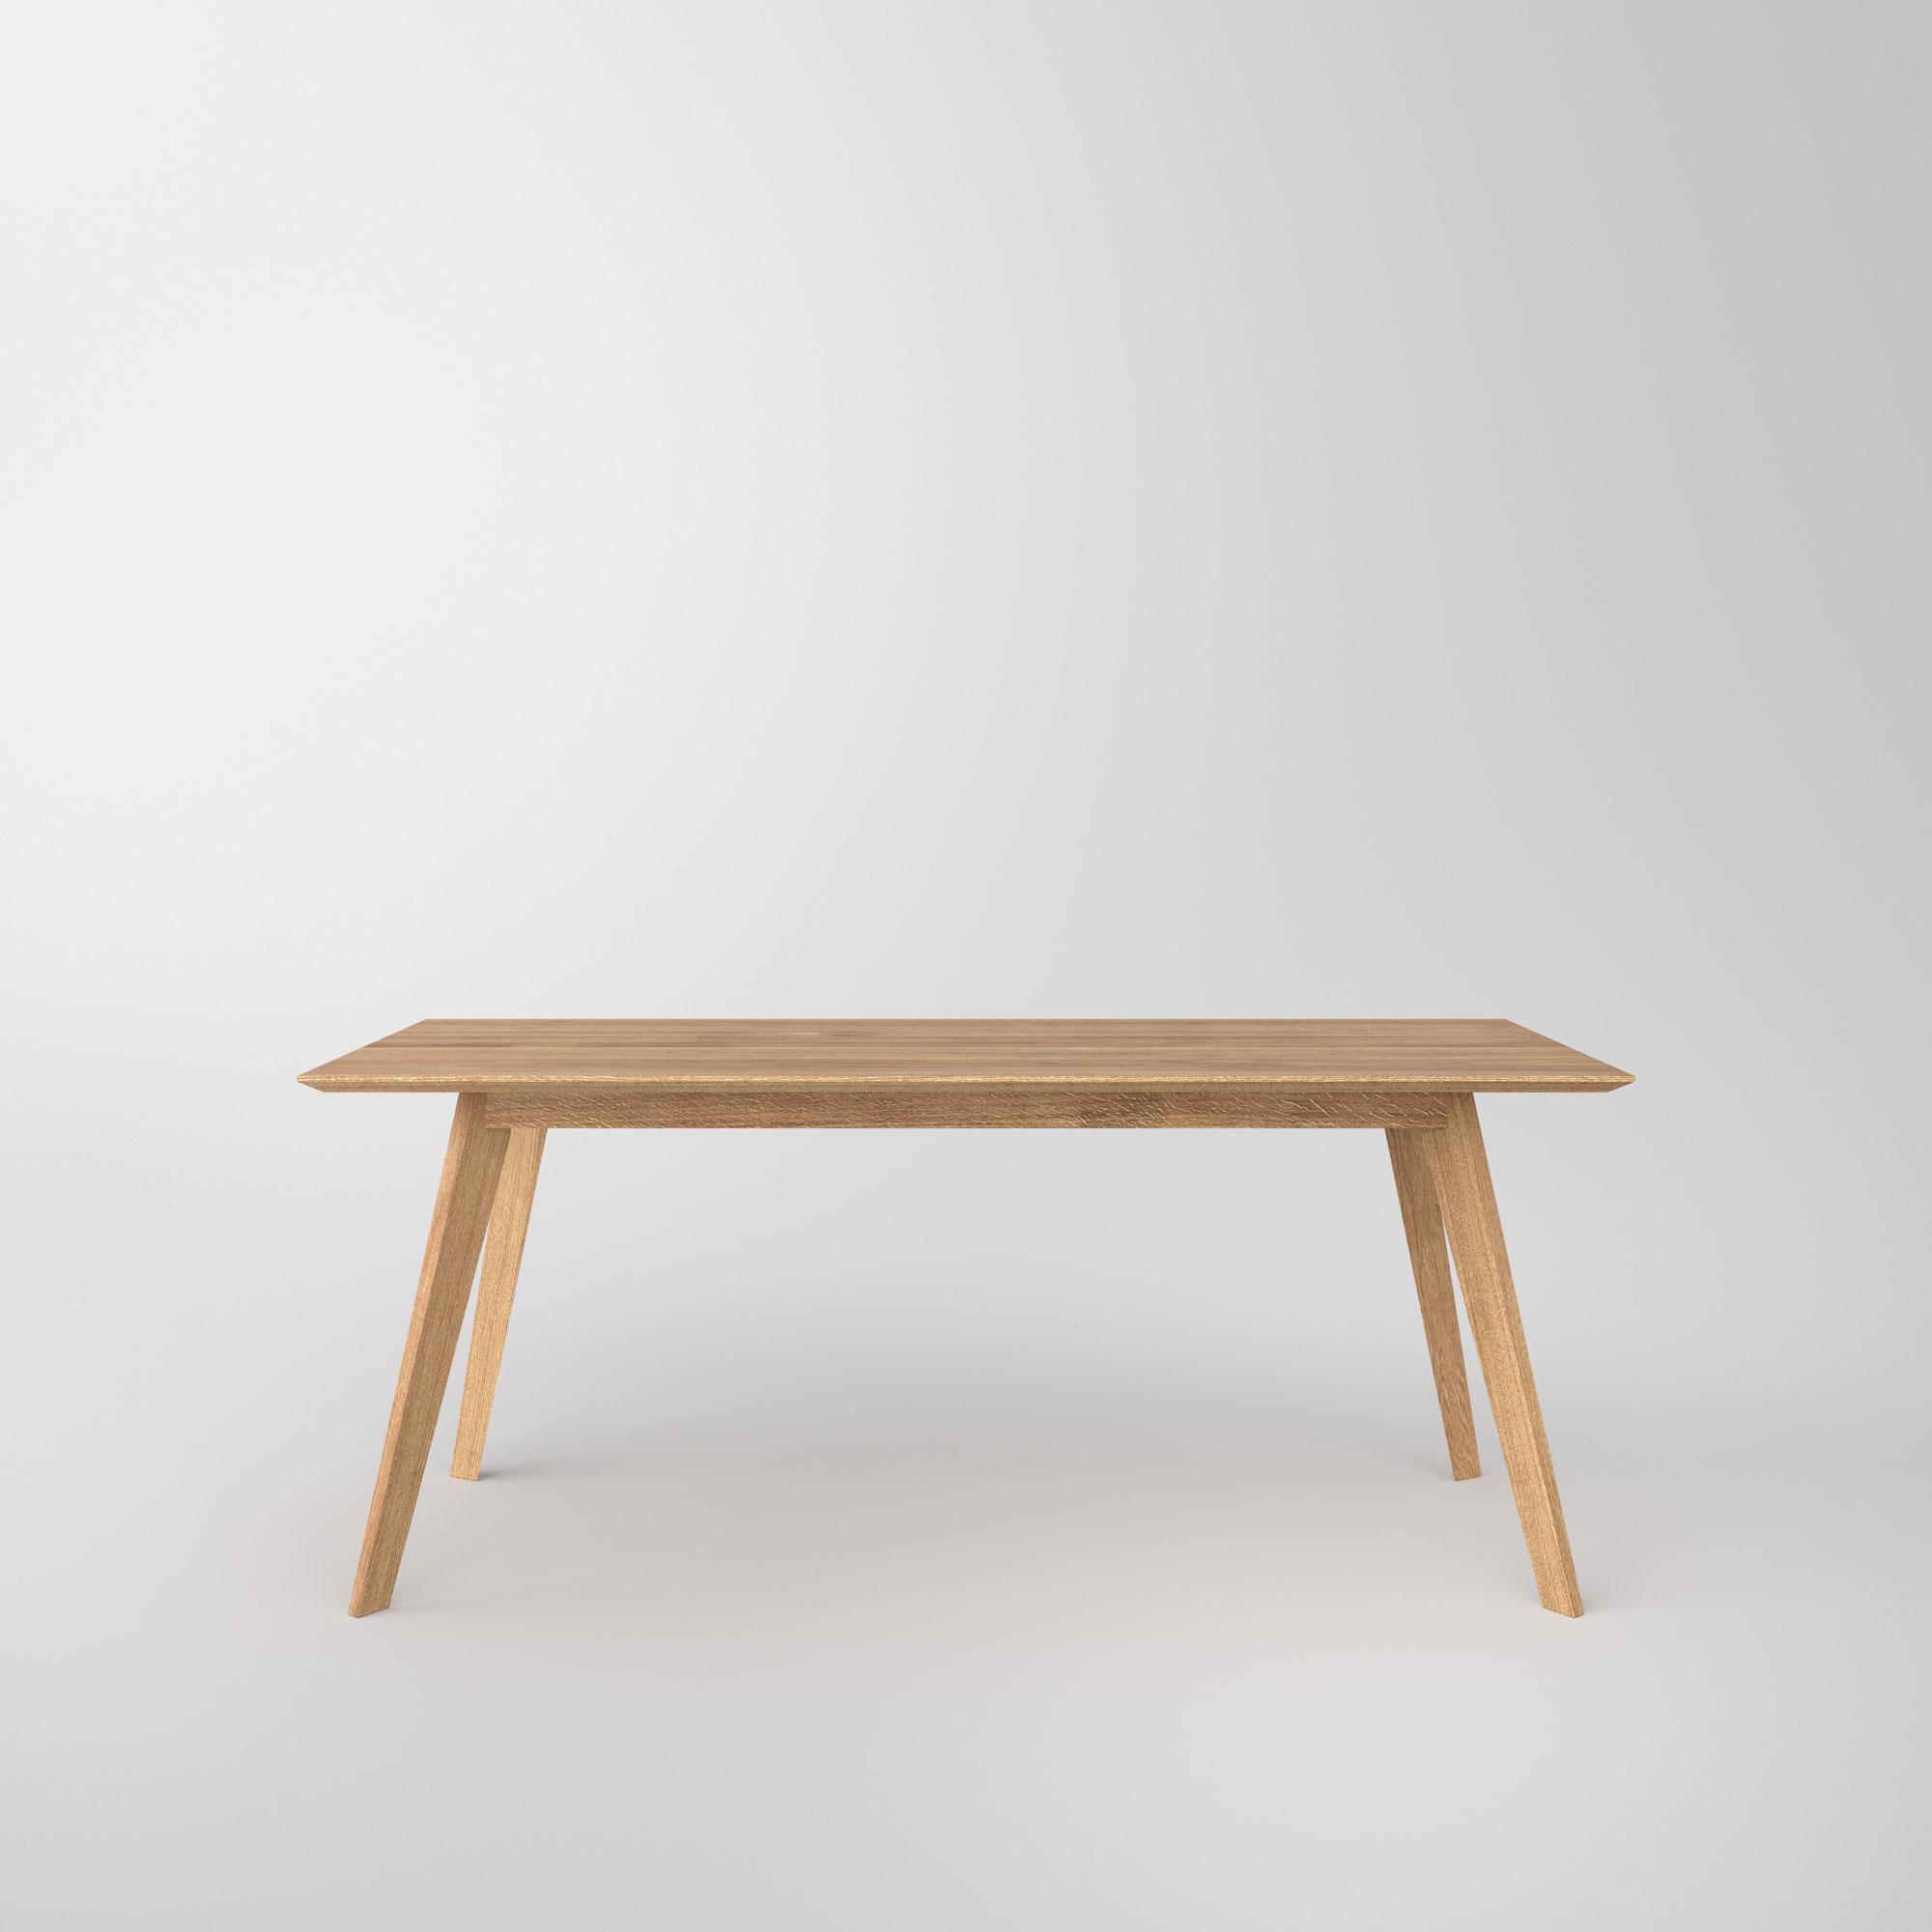 Filigraner massivholz esstisch citius vitamin design for Tisch vitamin design